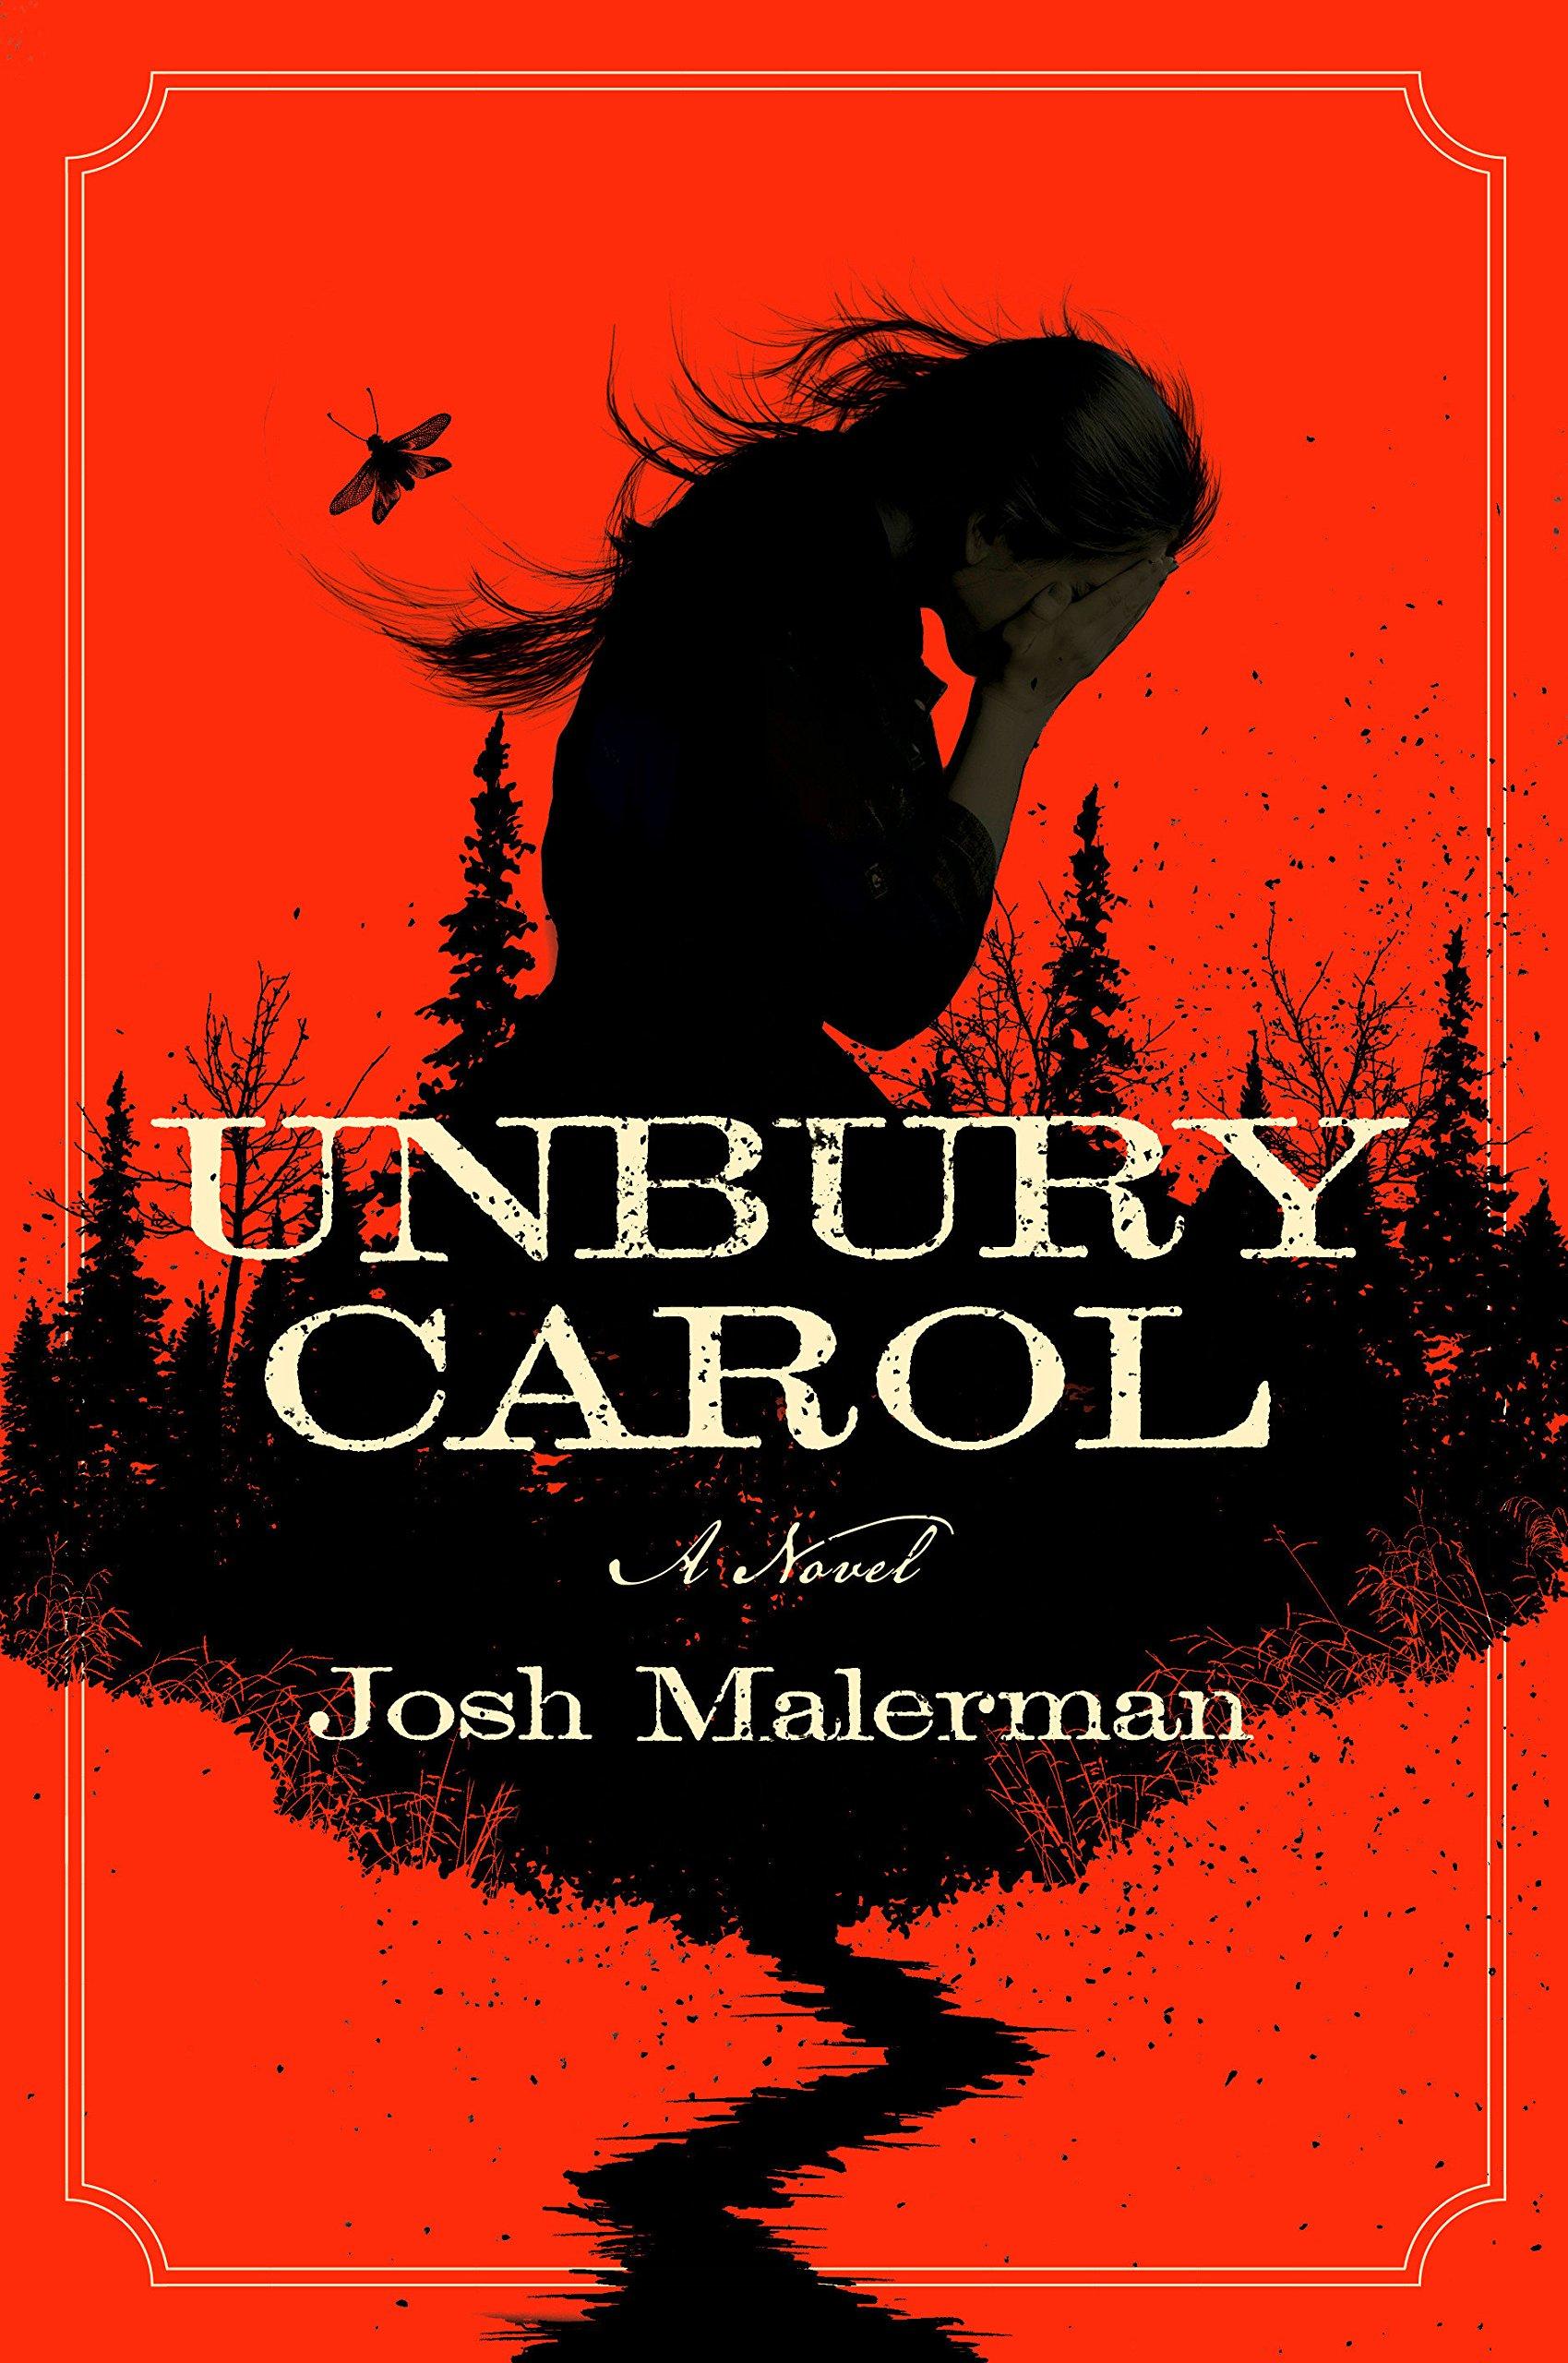 Unbury Carol, Josh Malerman, horror, klassisk skrekk